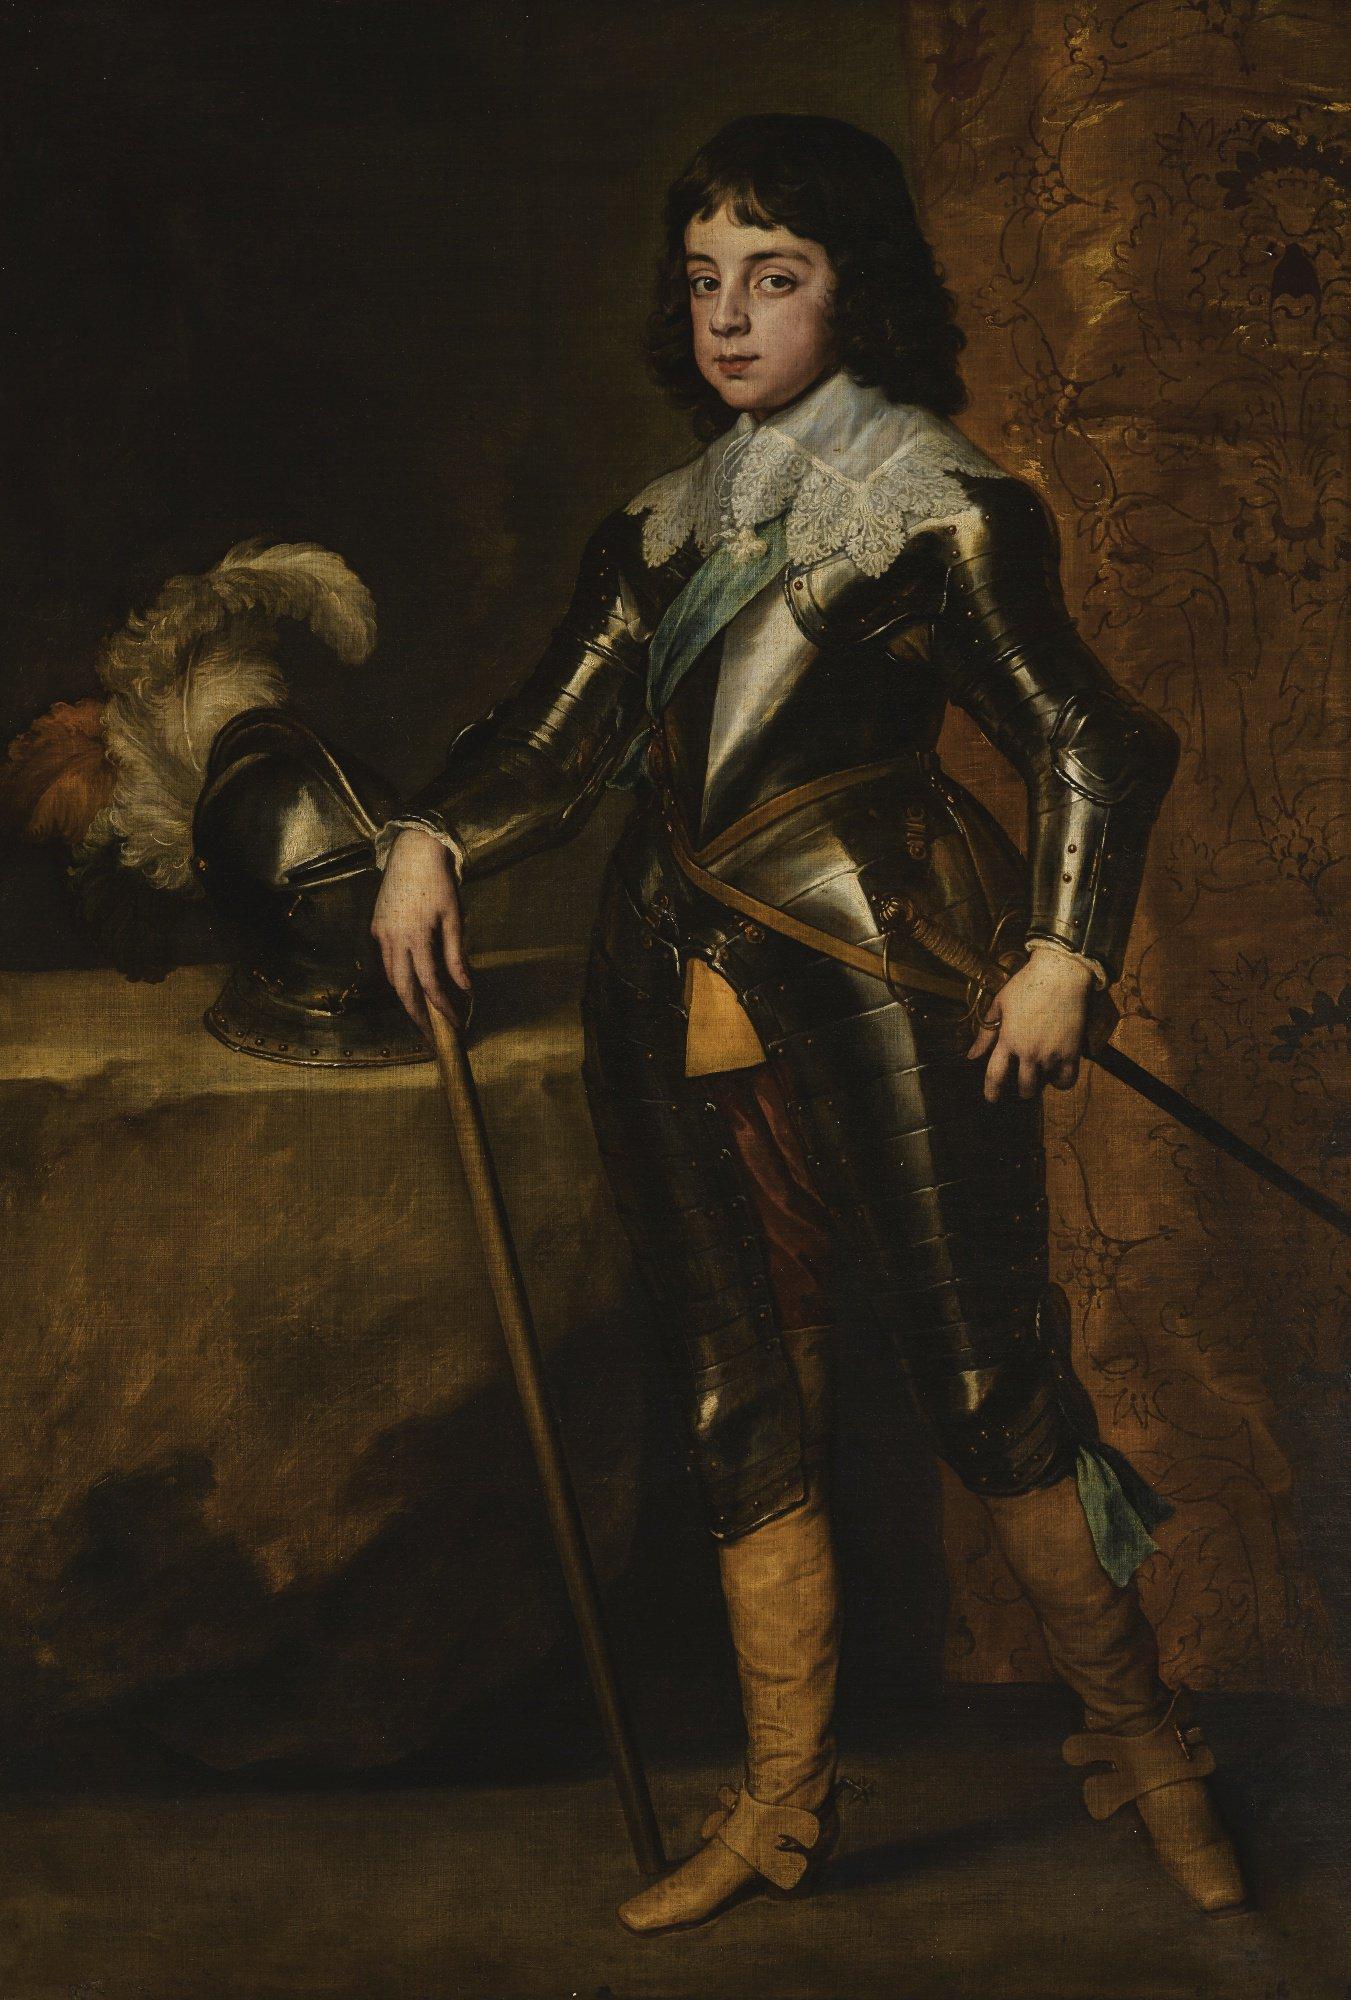 Картинки по запросу anthony van dyck charles ii prince of wales